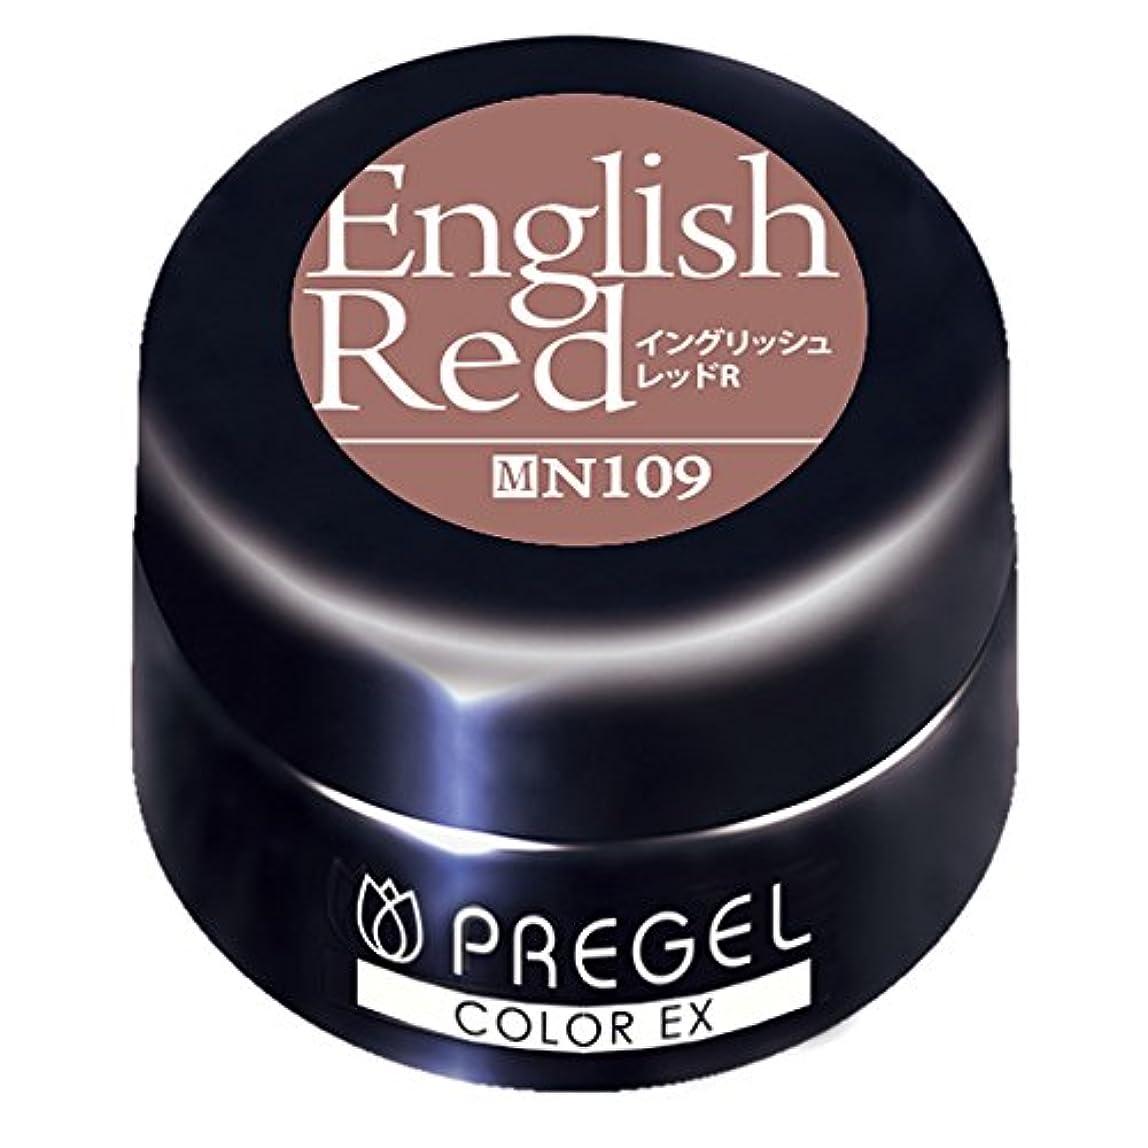 PRE GEL カラージェル カラーEX イングリッシュレッド R109 3g UV/LED対応タイオウ